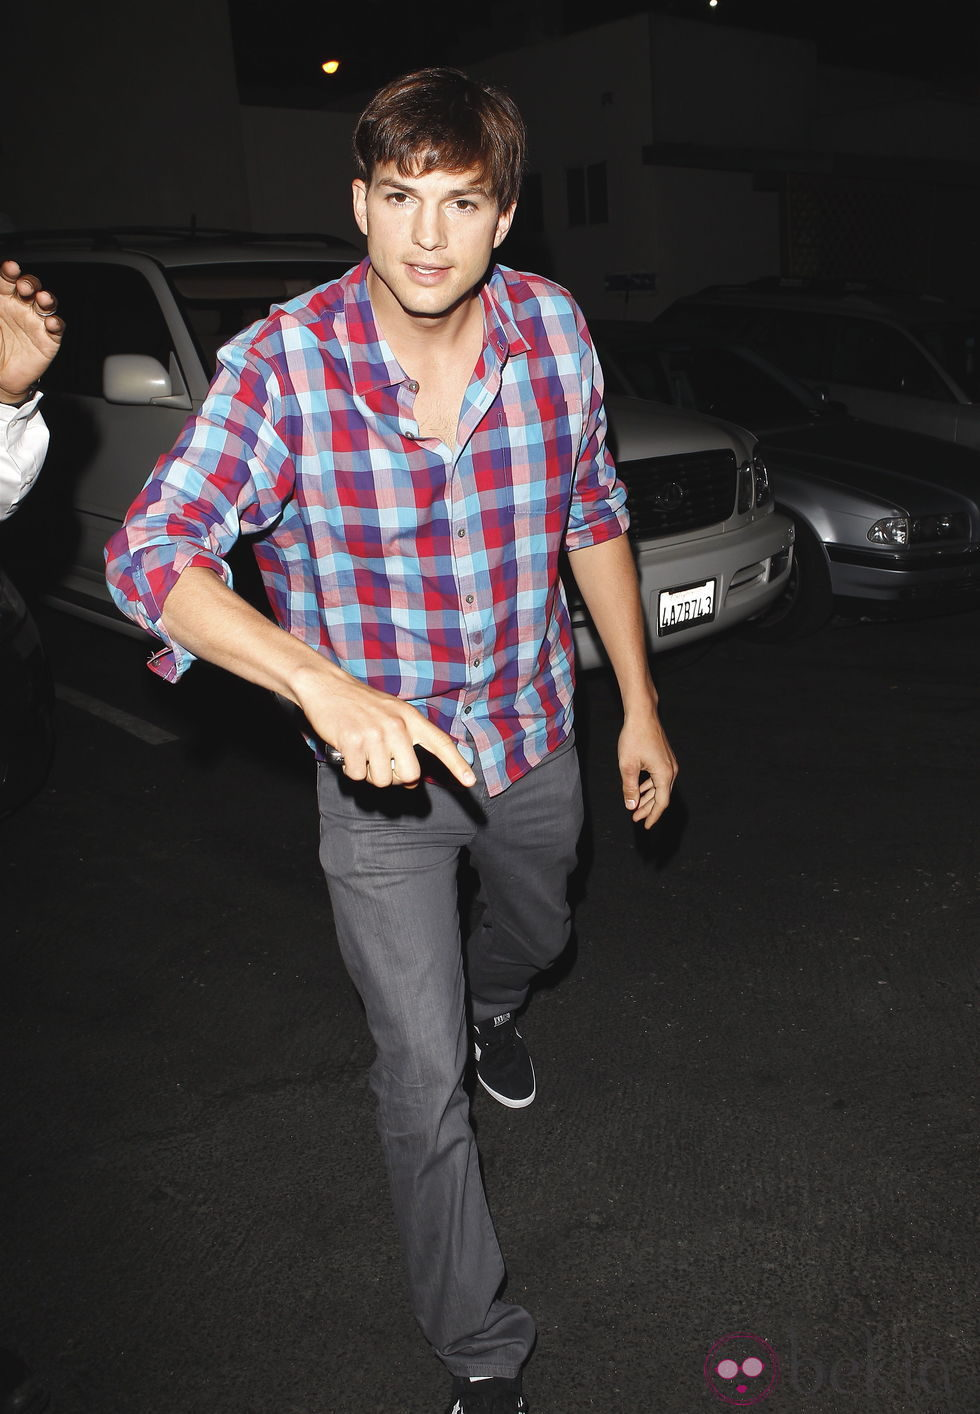 Ashton Kutcher amenaza a los paparazzi tras descubrirle con Mila Kunis